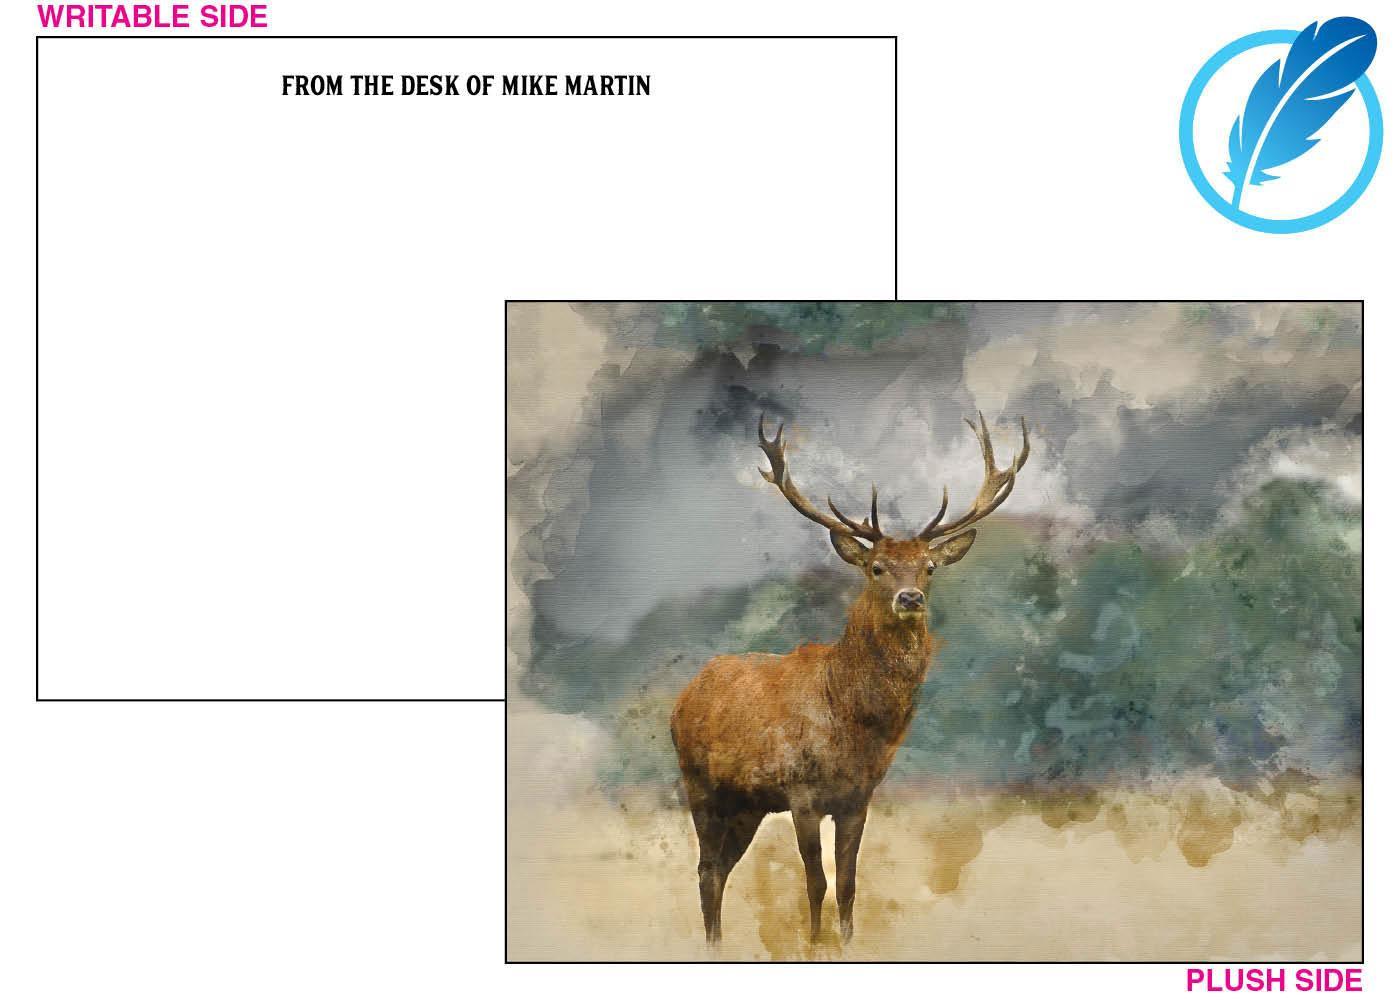 Majestic buck note card